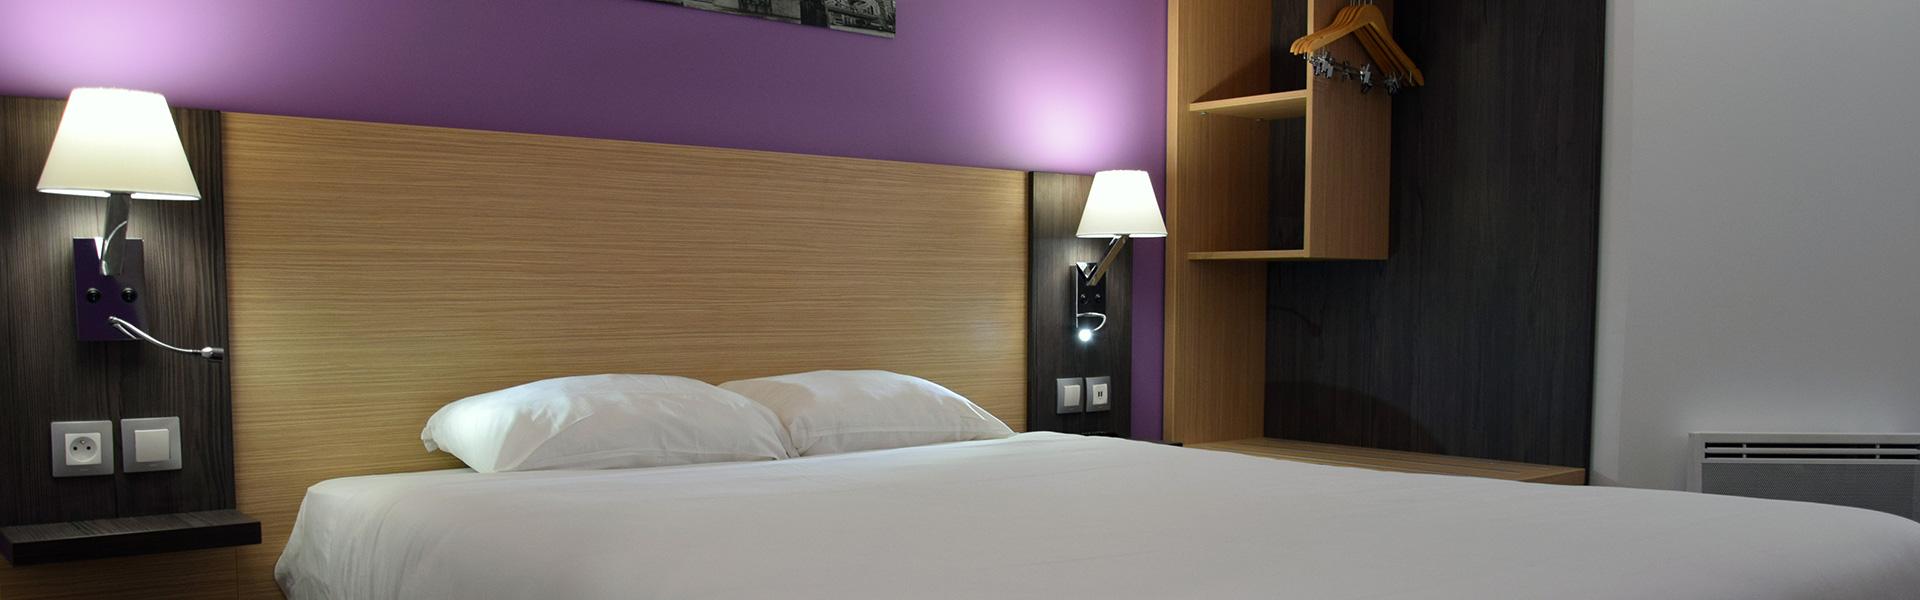 hotel_bleu_france_chambre_violet_1920x600